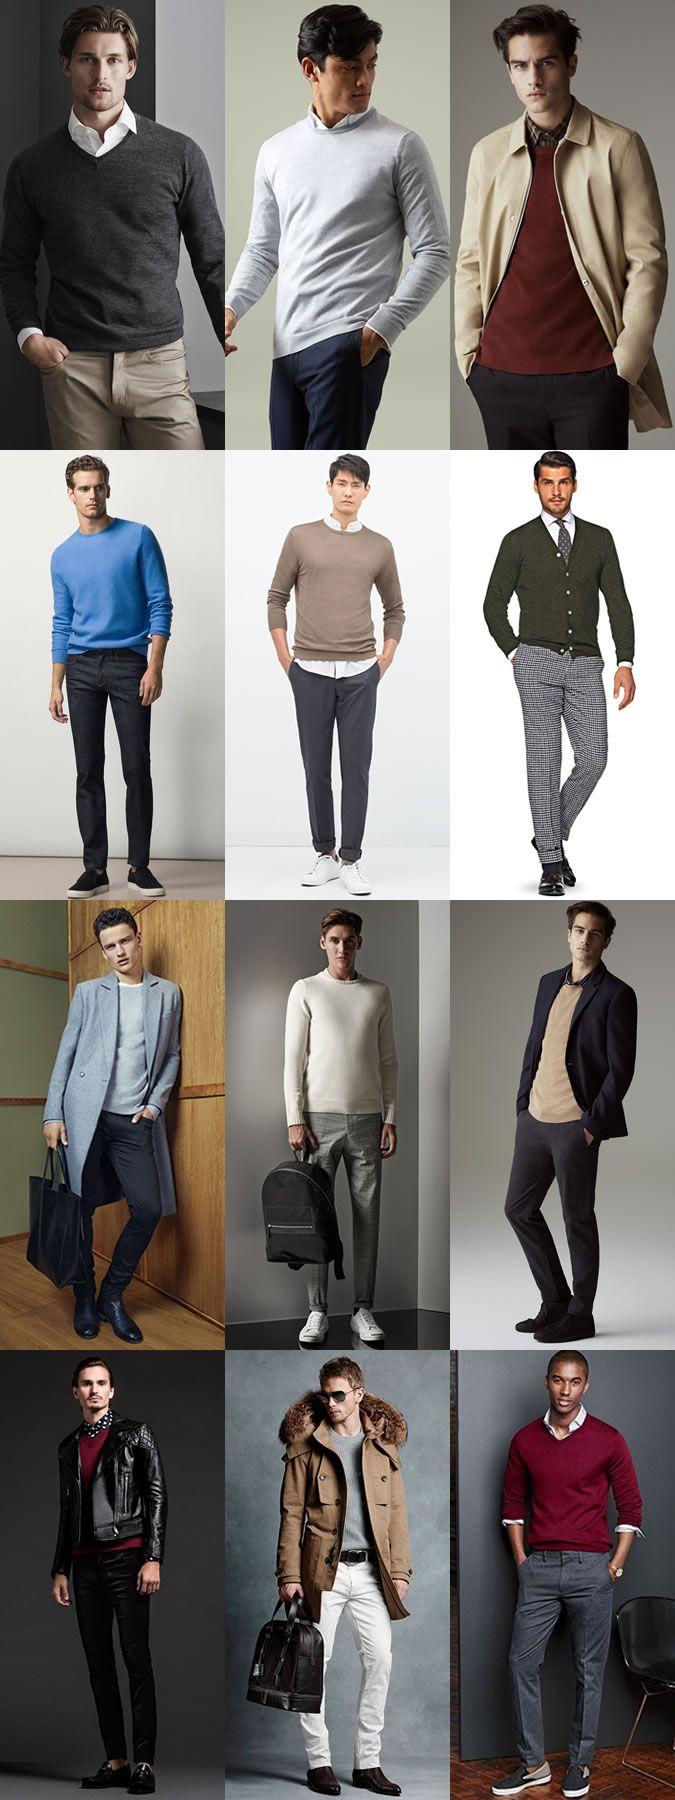 Men's Autumn Wardrobe Essentials: Lightweight Knitwear Autumn Outfit Inspiration Lookbook